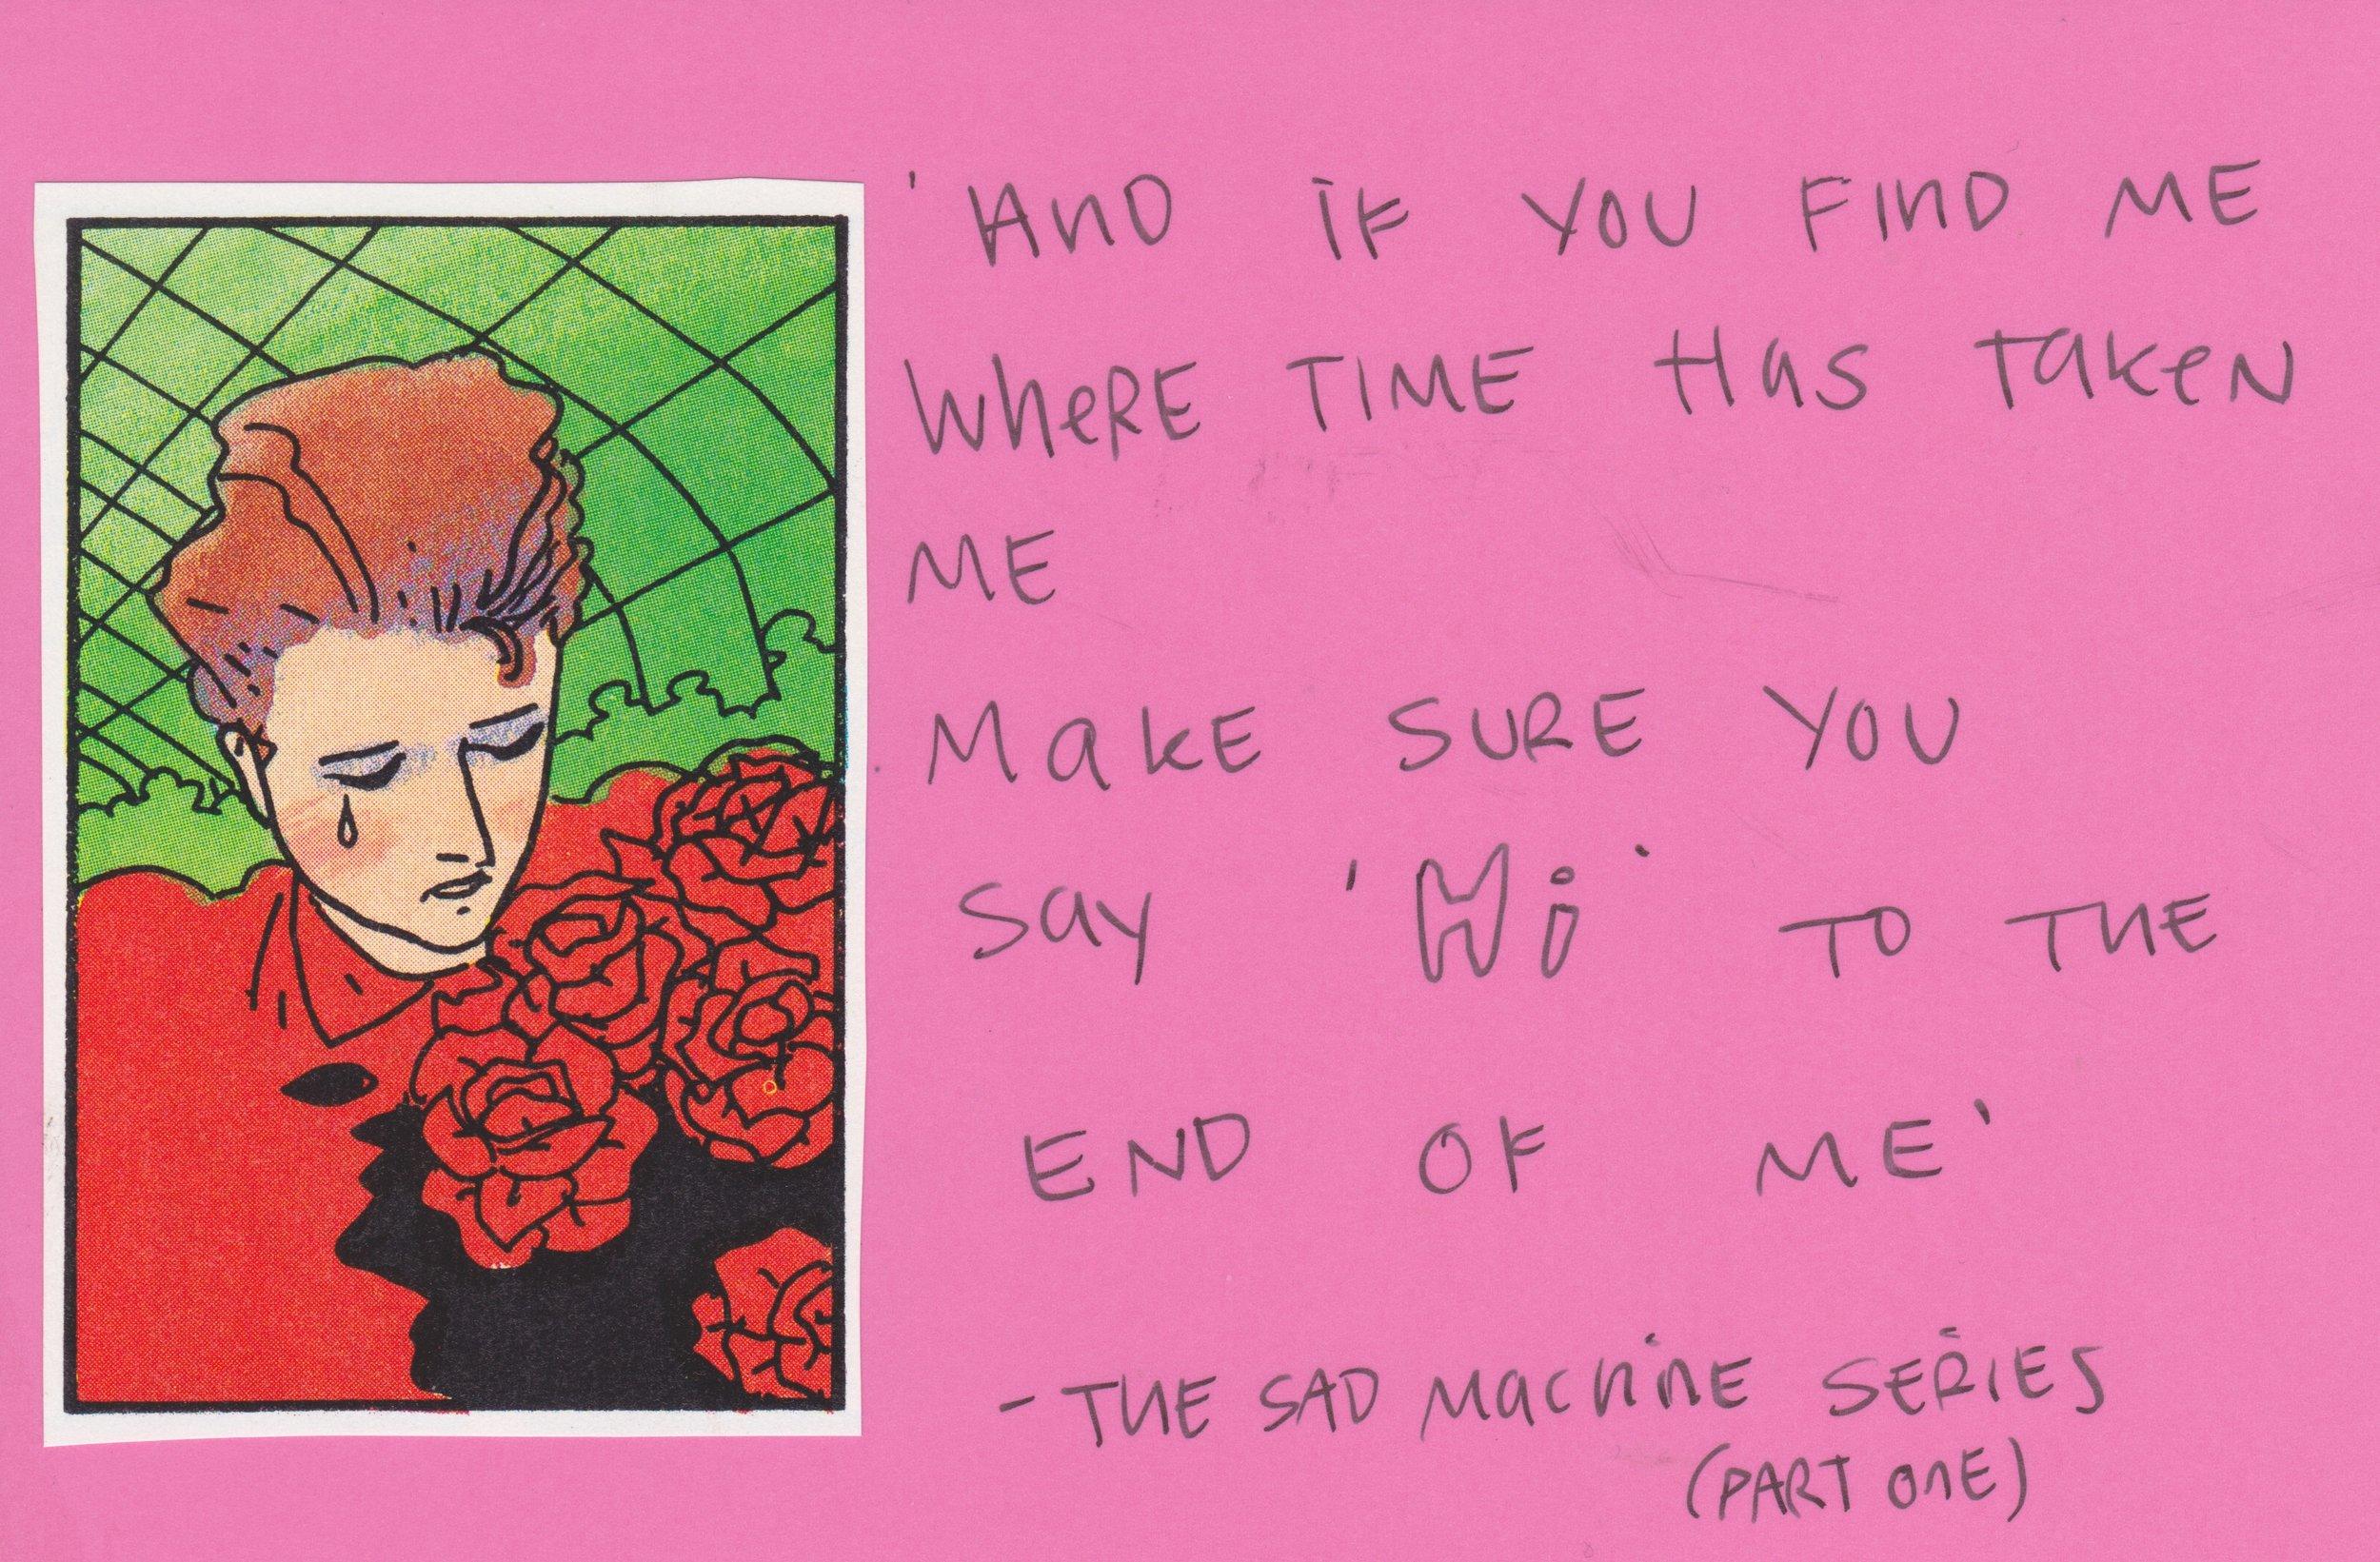 The Sad Machine Series Quotes 19 1.jpeg